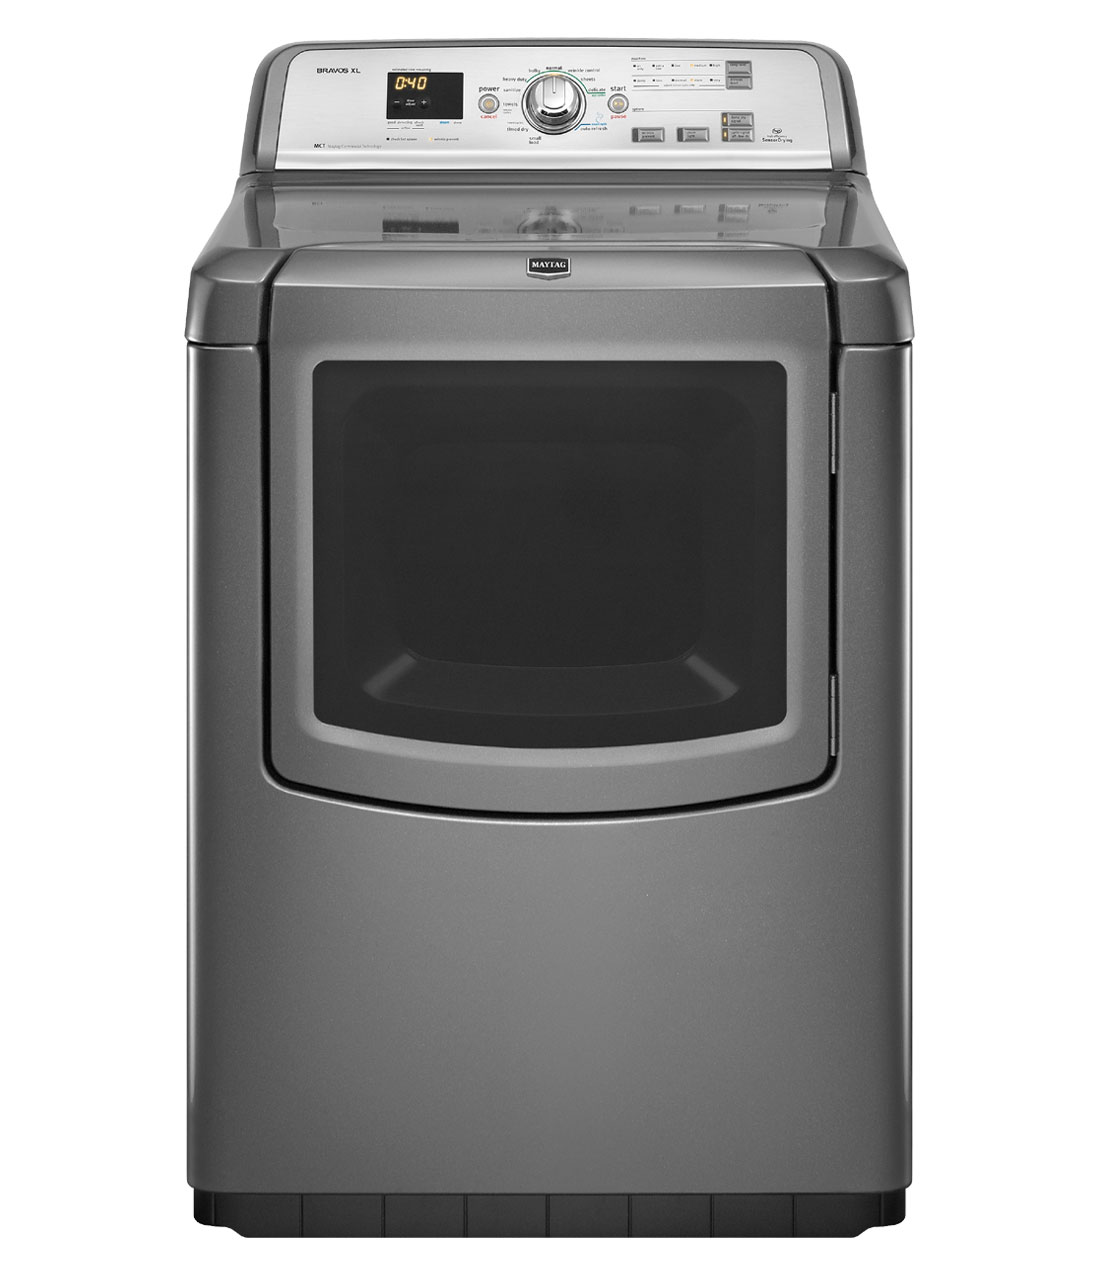 Maytag Bravos XL 7.3 cu. ft. Electric Dryer with Steam